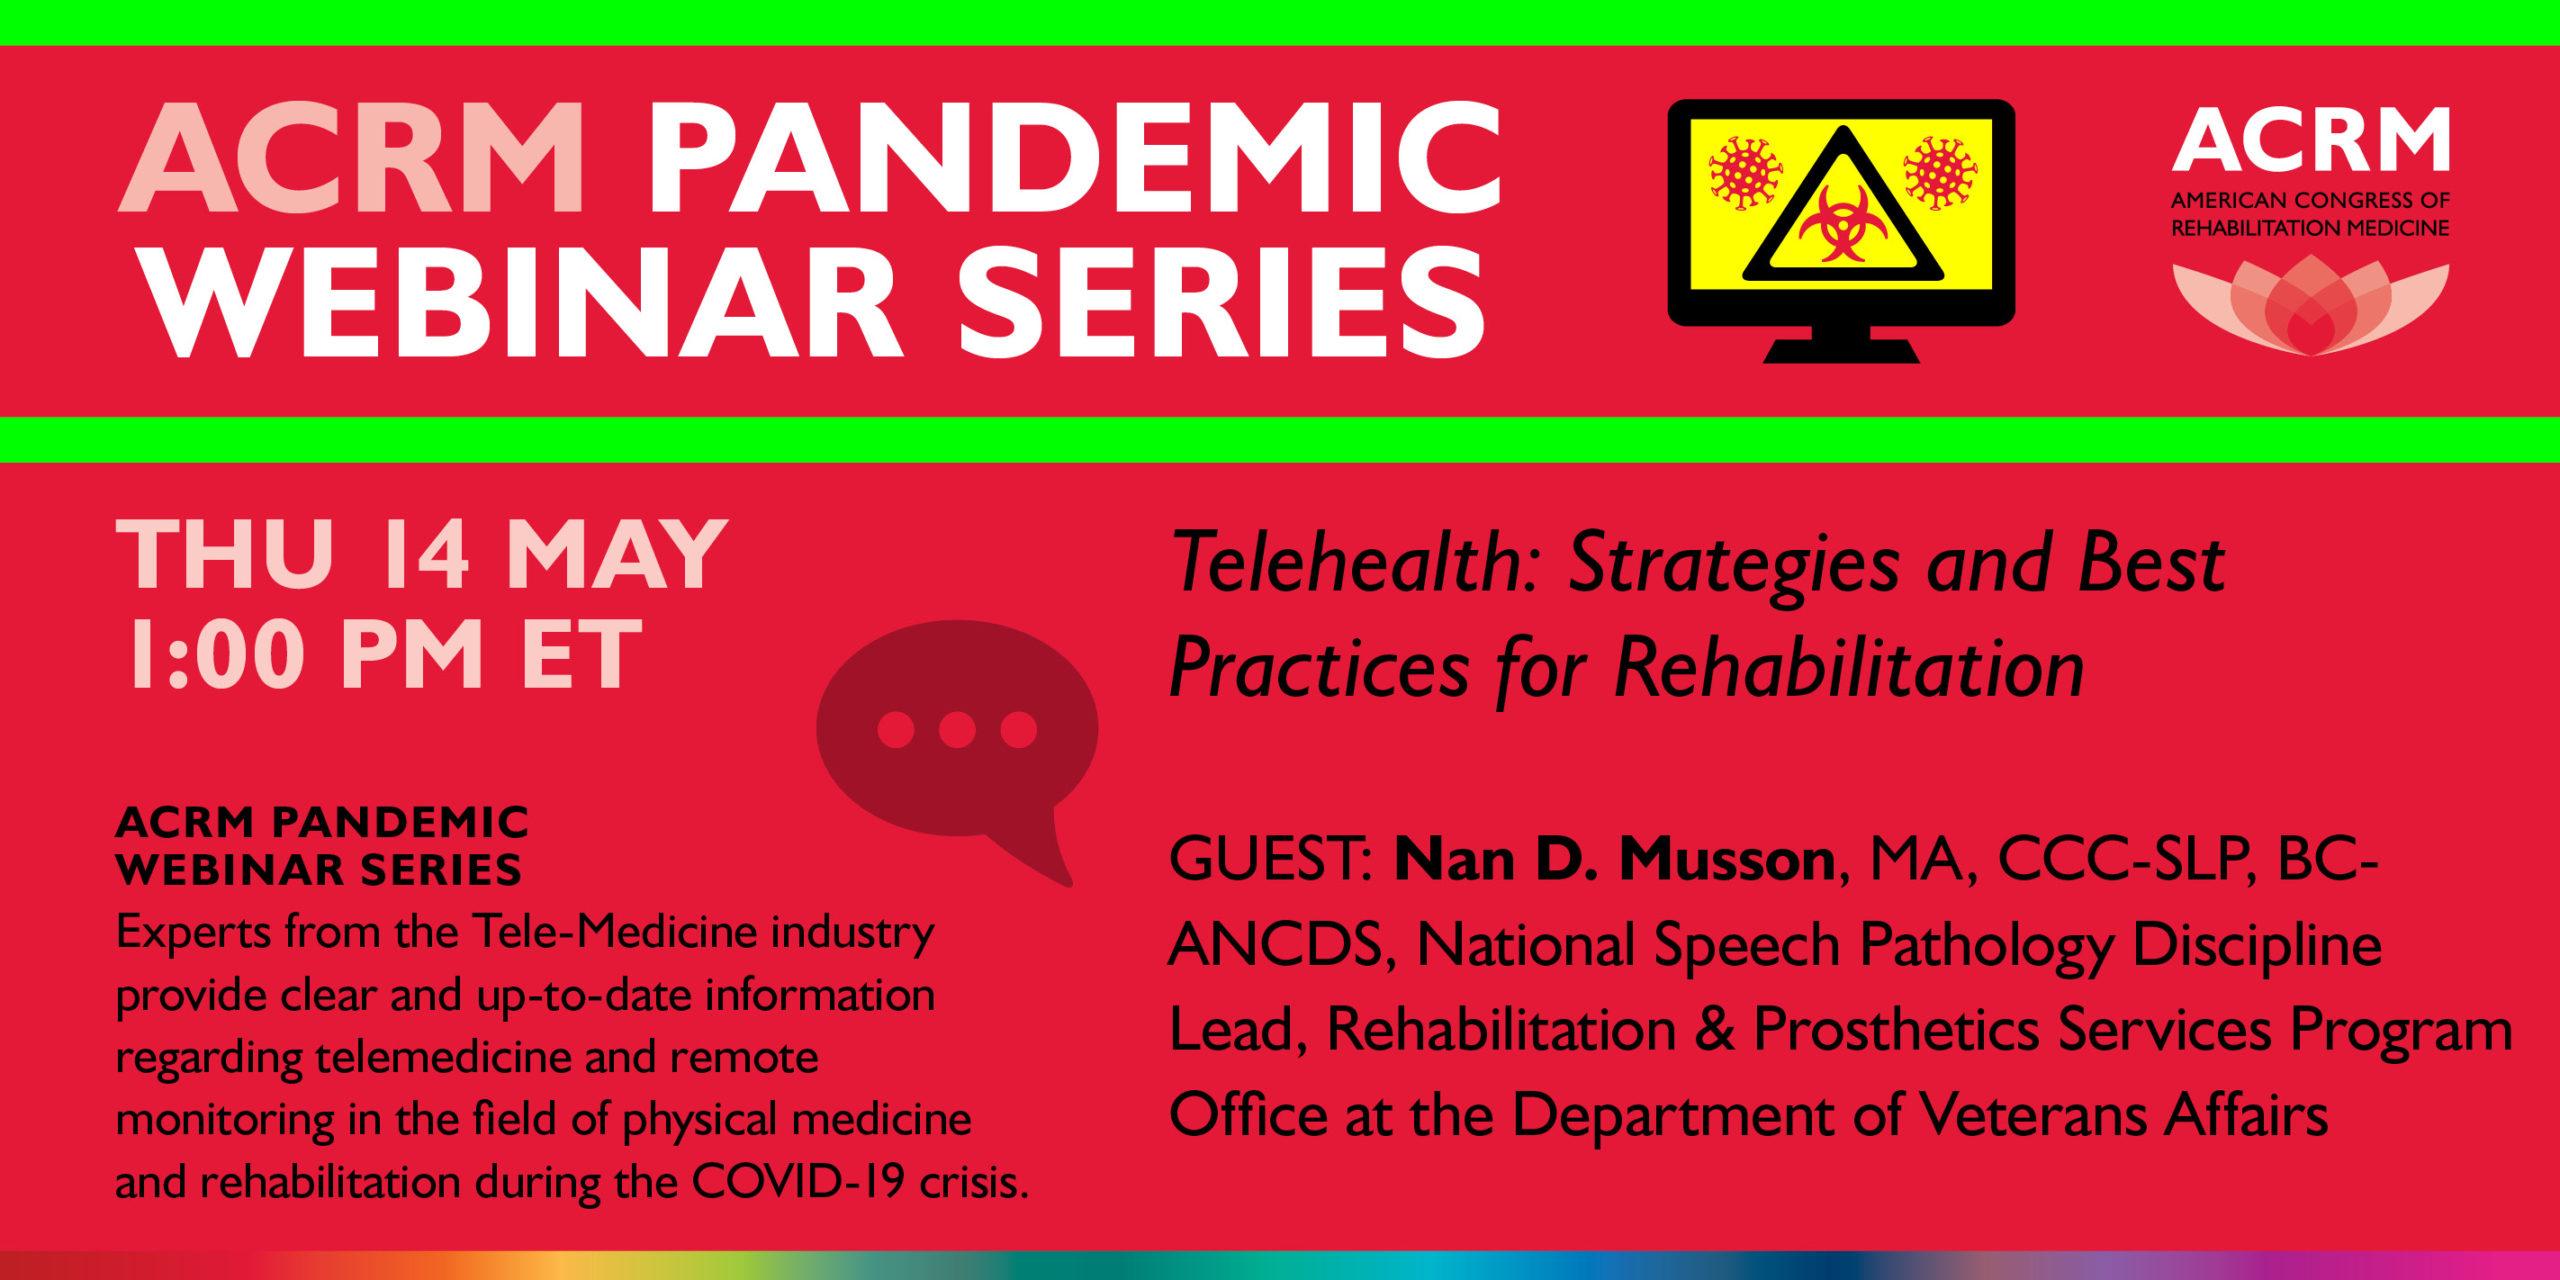 ACRM Pandemic Webinar image